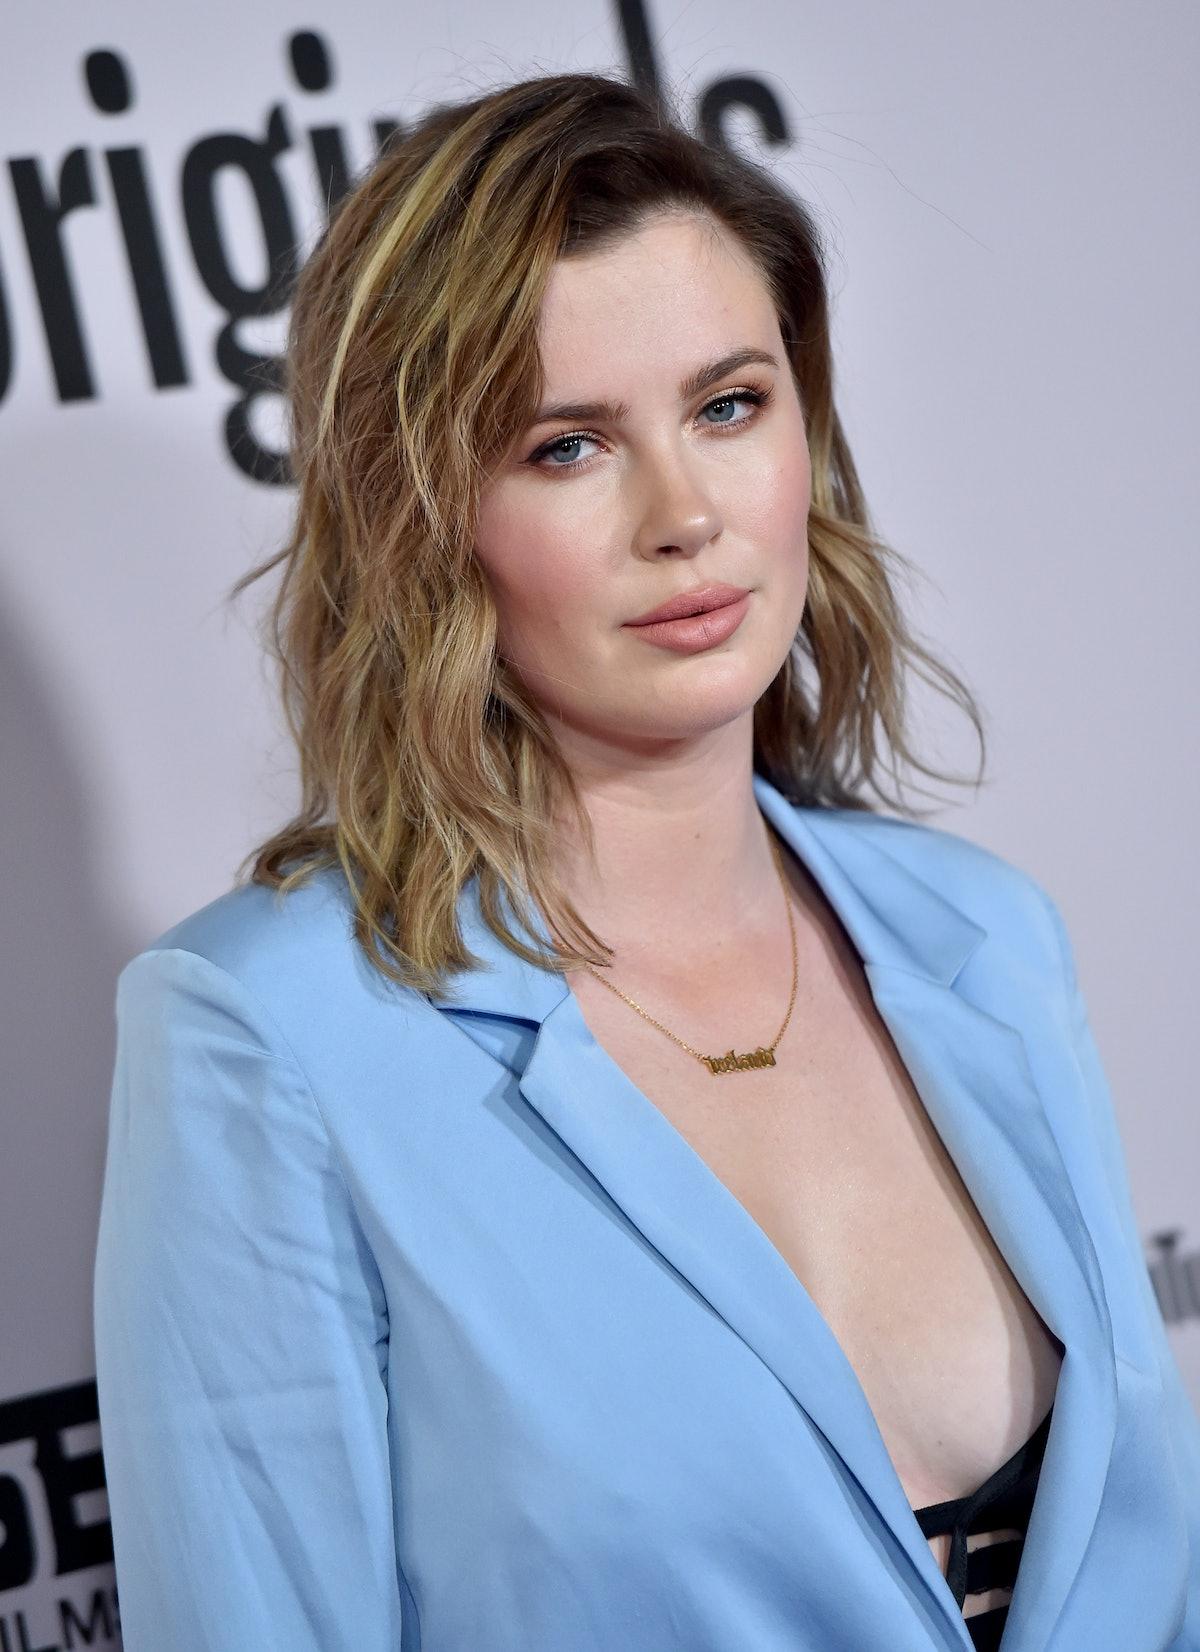 ft Ireland Baldwin Addressed Rumors She Got A Kendall Jenner Tattoo.